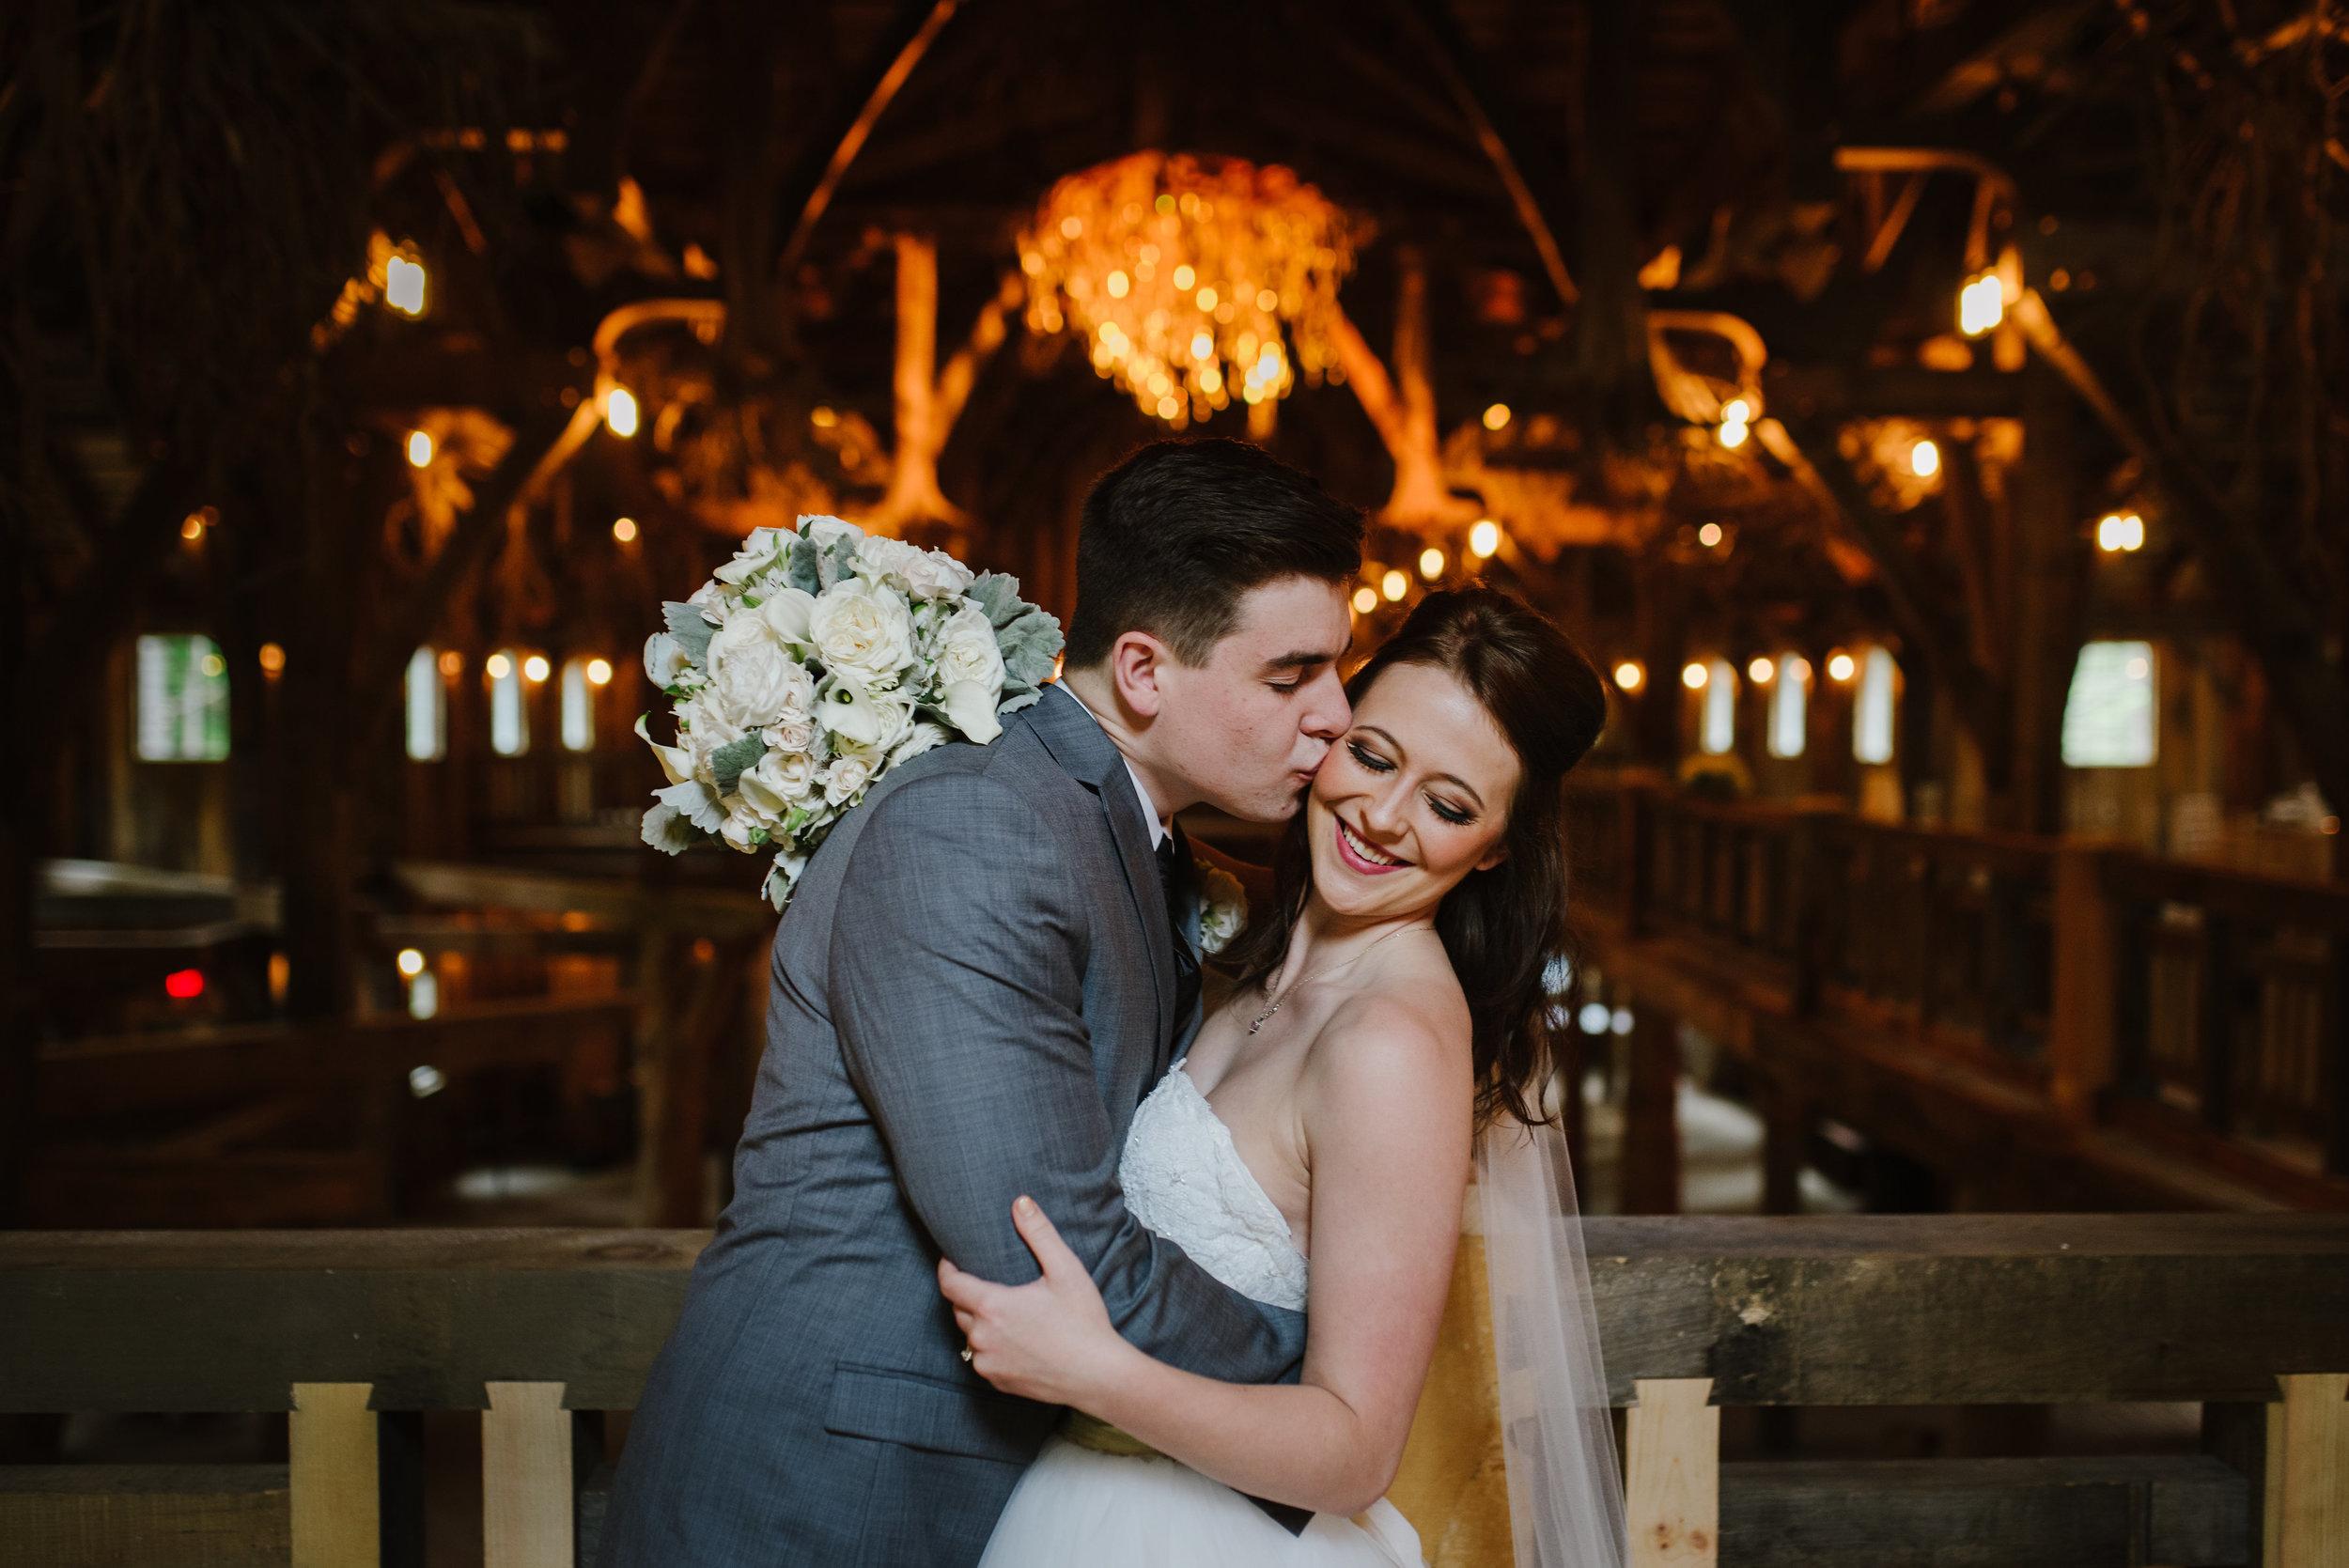 Wisconsin dells wedding planner - Tara draper photography